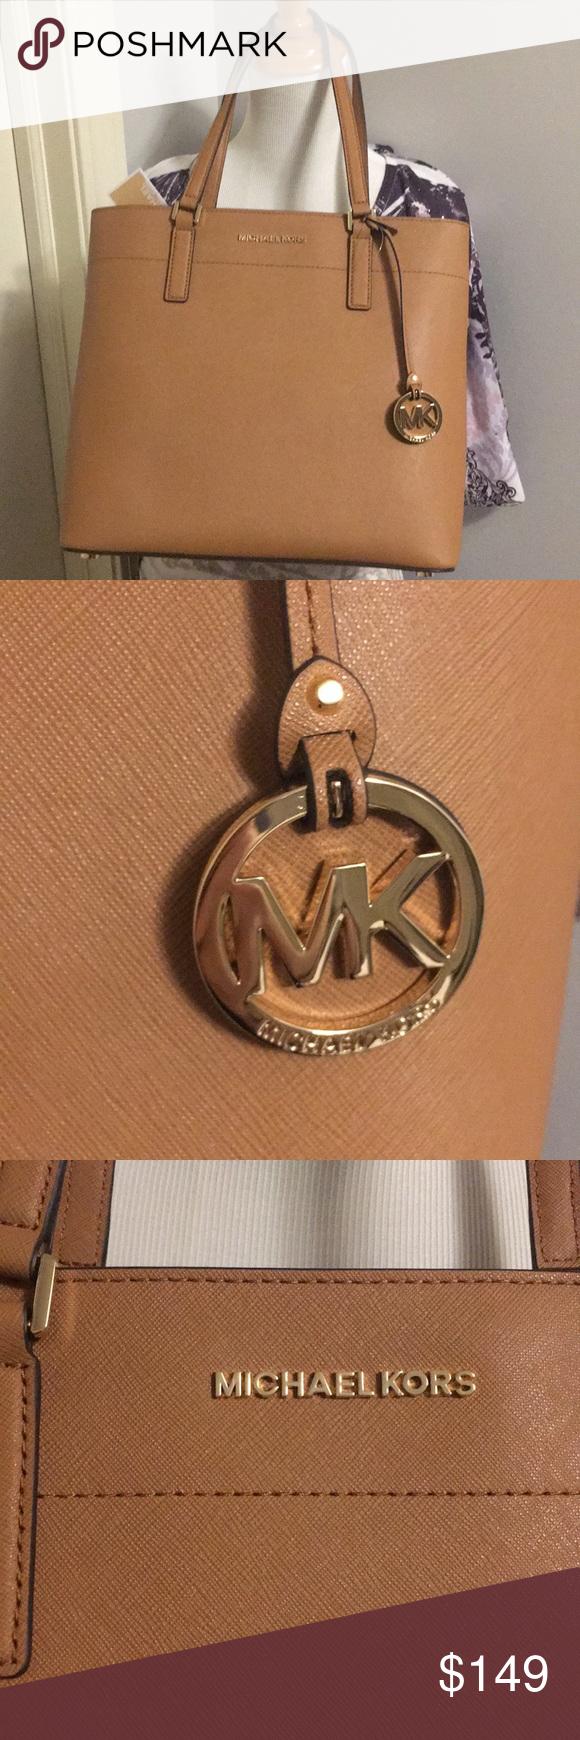 "dbe8088c5392 Michael Kors Morgan Large Leather Tote Acorn color . Bag length 11 1/2"". Bag  height 11.25"". Handle drop 9"". Michael Kors Bags Totes"